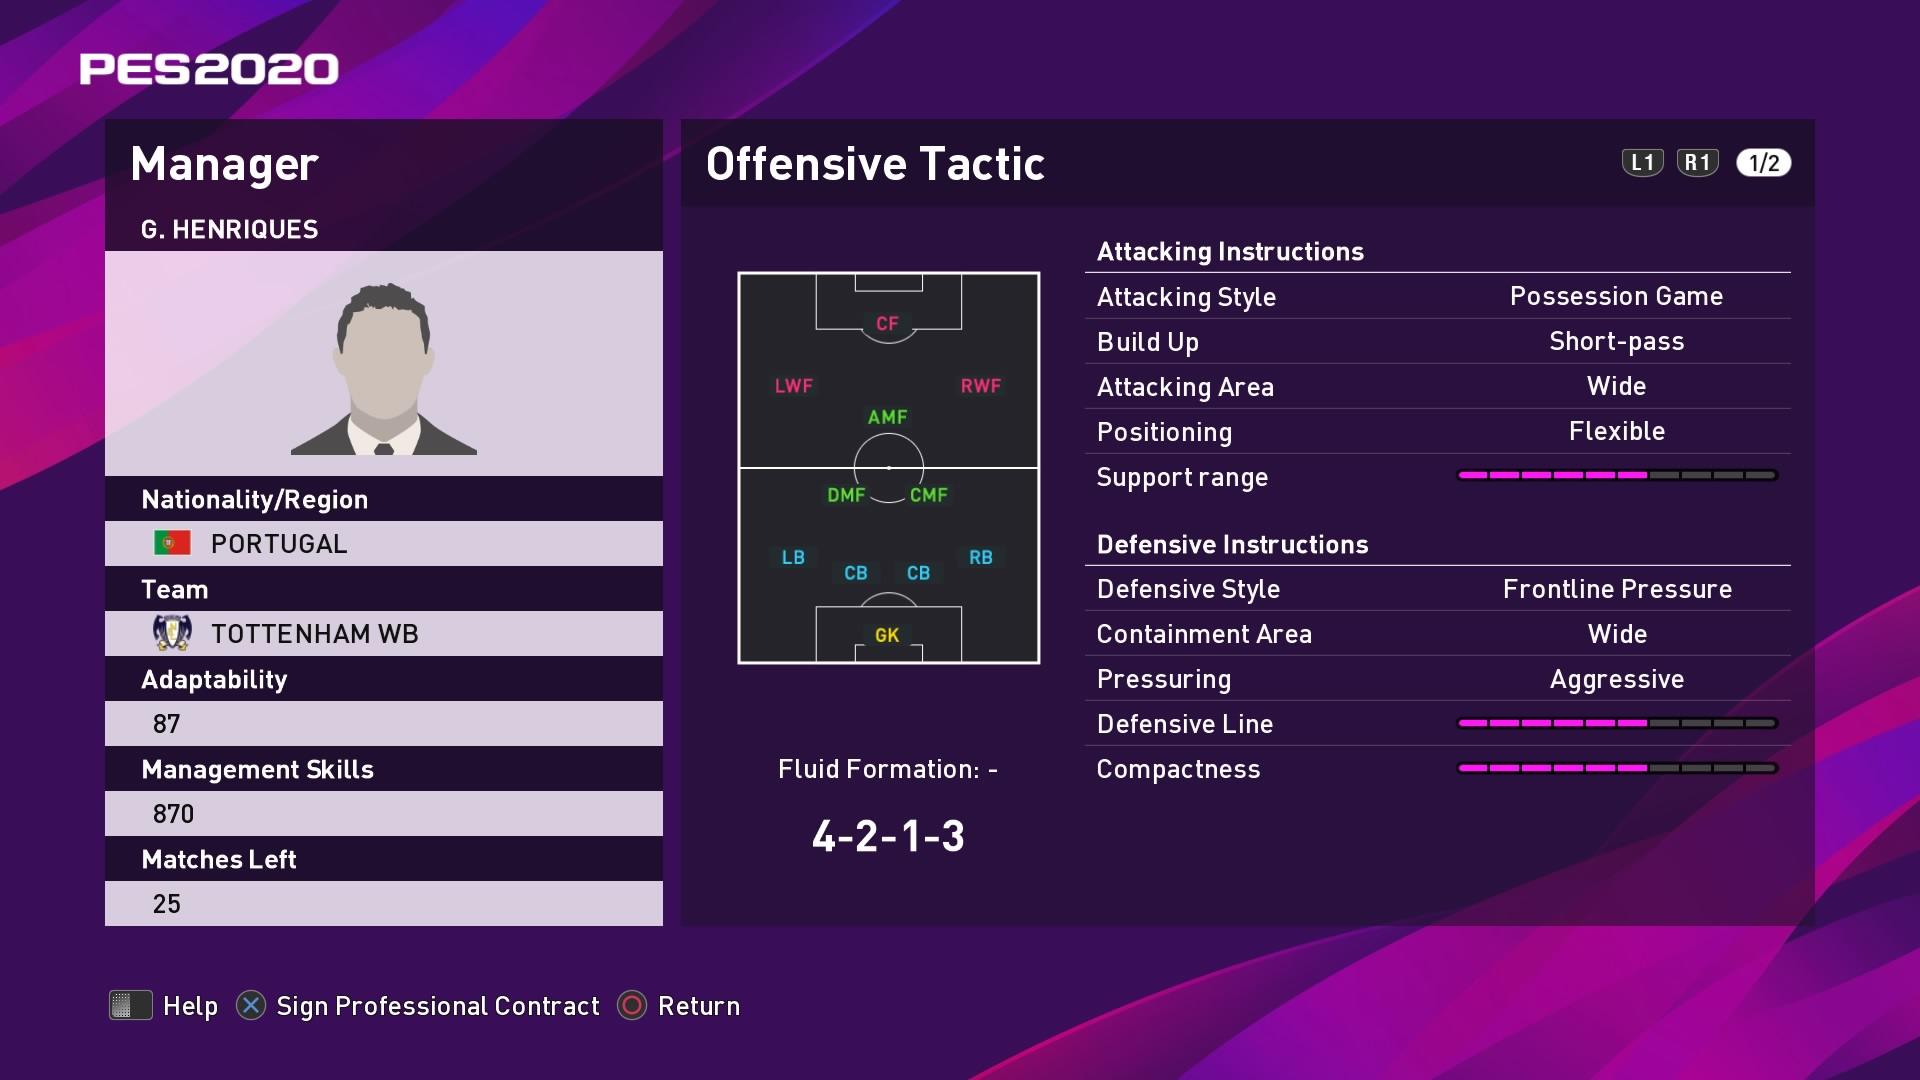 G. Henriques (2) (José Mourinho) Offensive Tactic in PES 2020 myClub